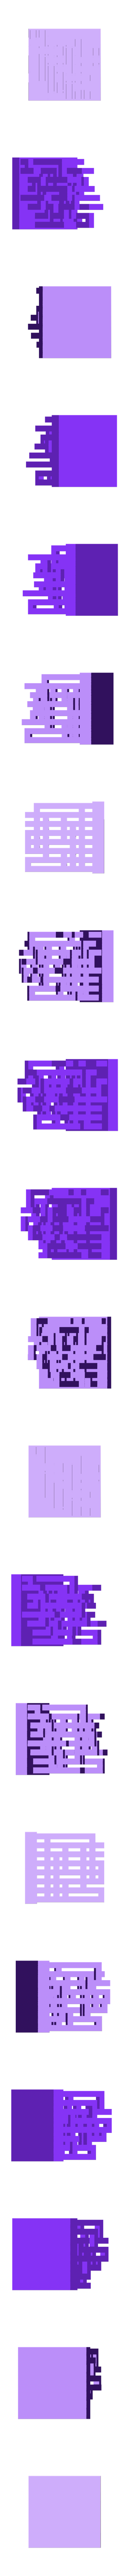 squared_2.stl Download free STL file Procedural Loops  • 3D print template, ferjerez3d